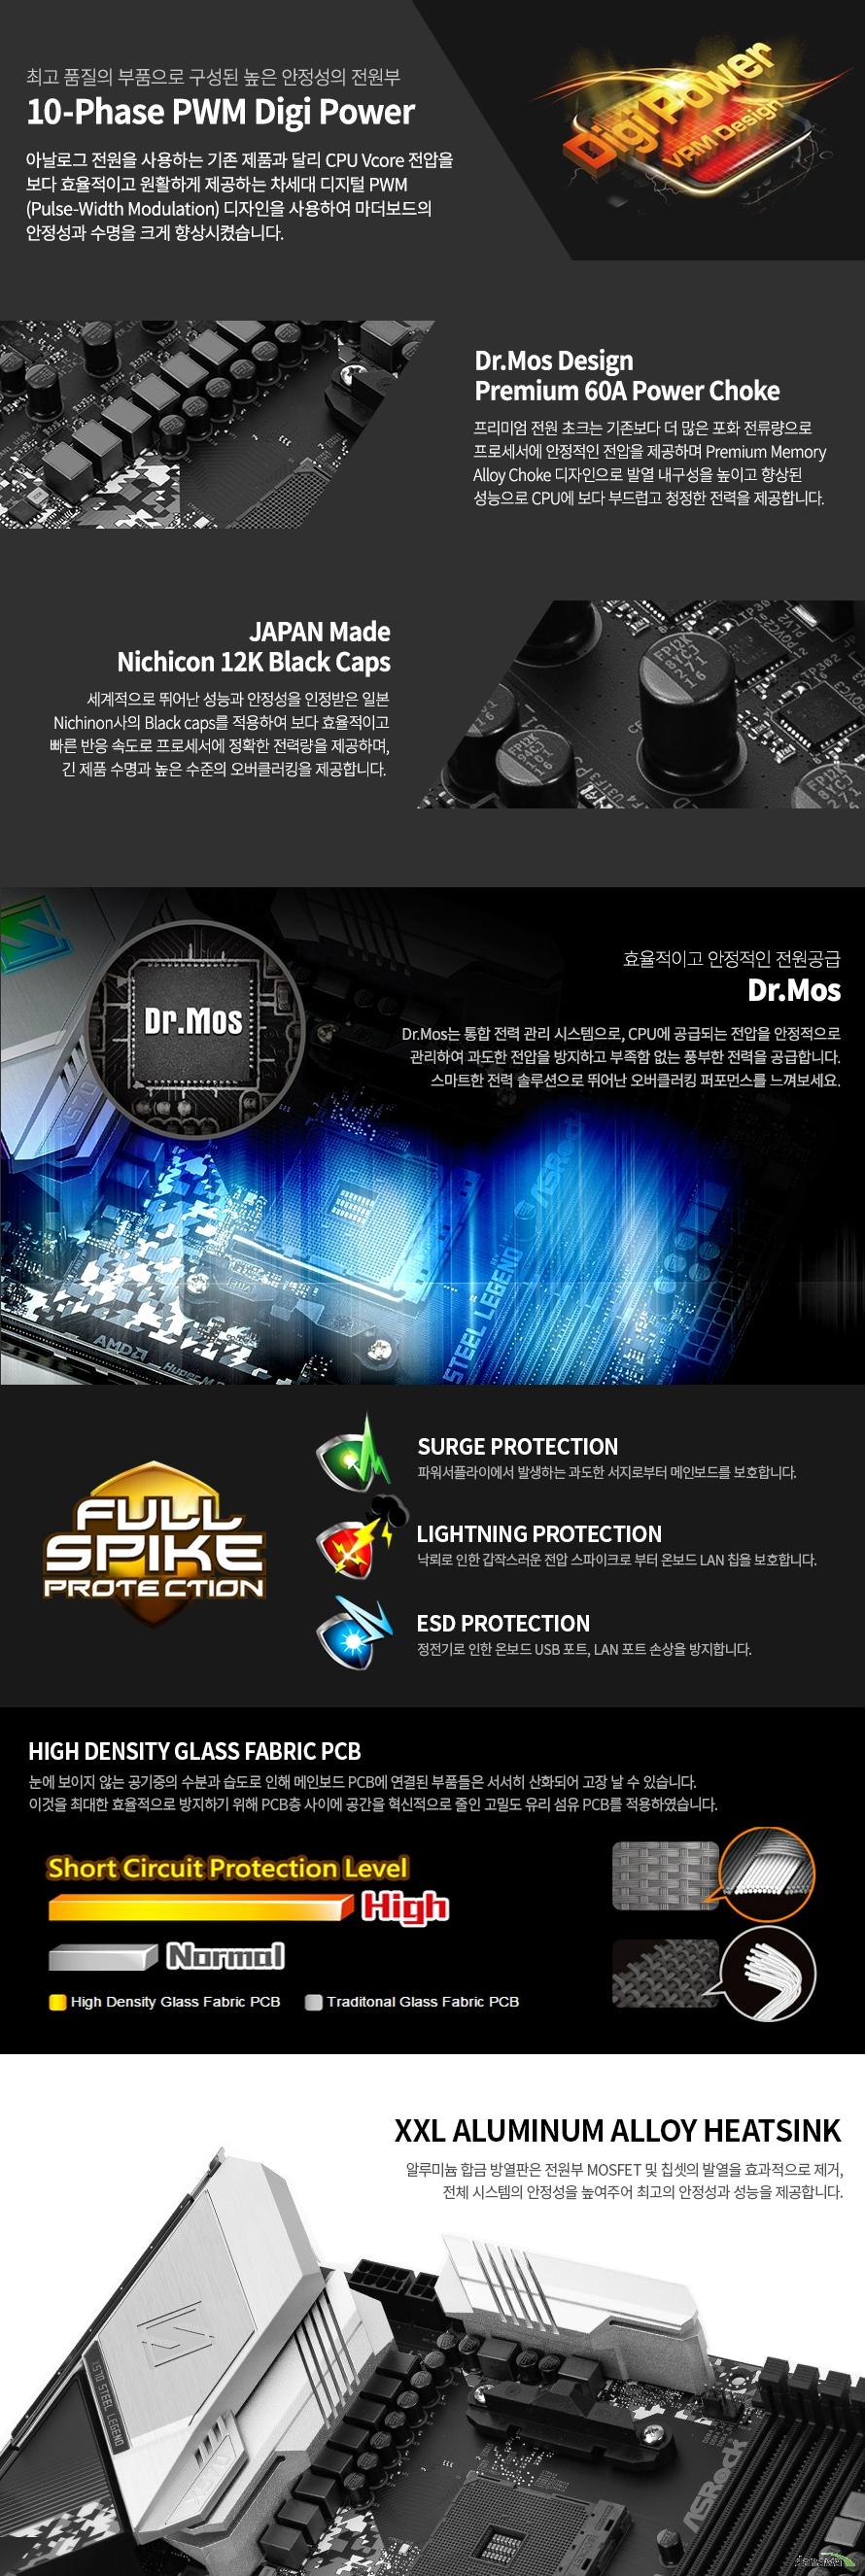 ASRock  X570 스틸레전드 디앤디컴